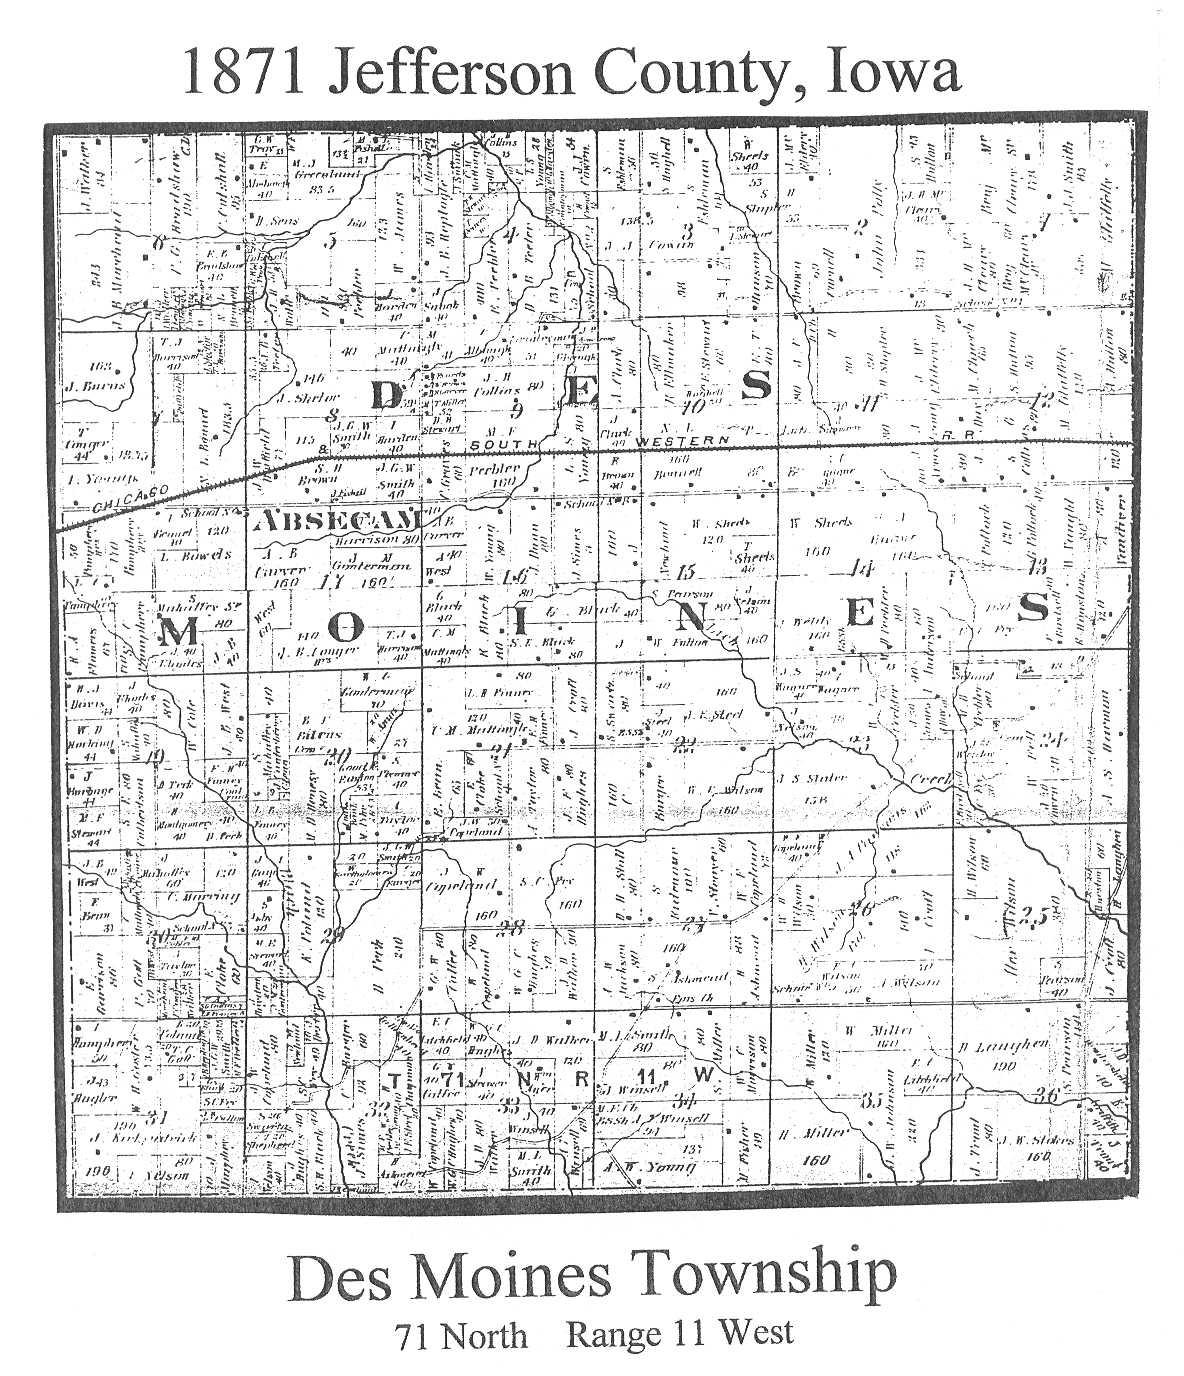 Jefferson County Iowa Map.1871 Map Of Jefferson County Property Owners